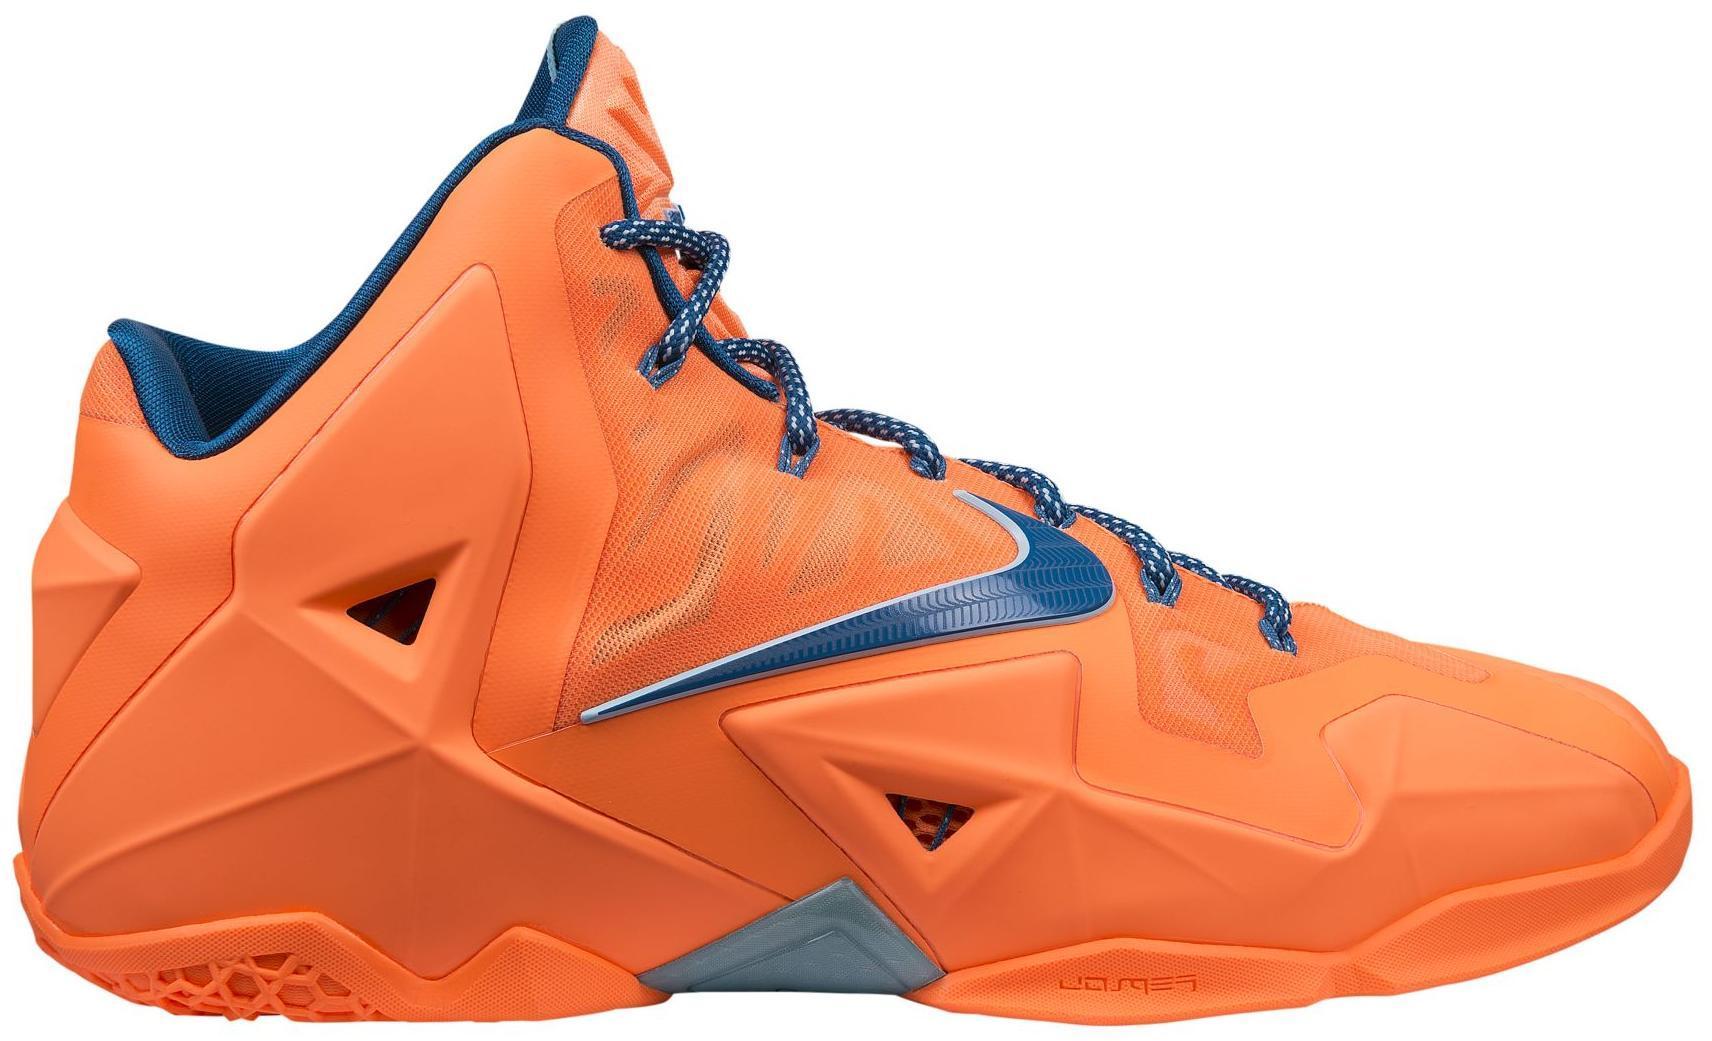 Nike LeBron 11 Knicks - 616175-800